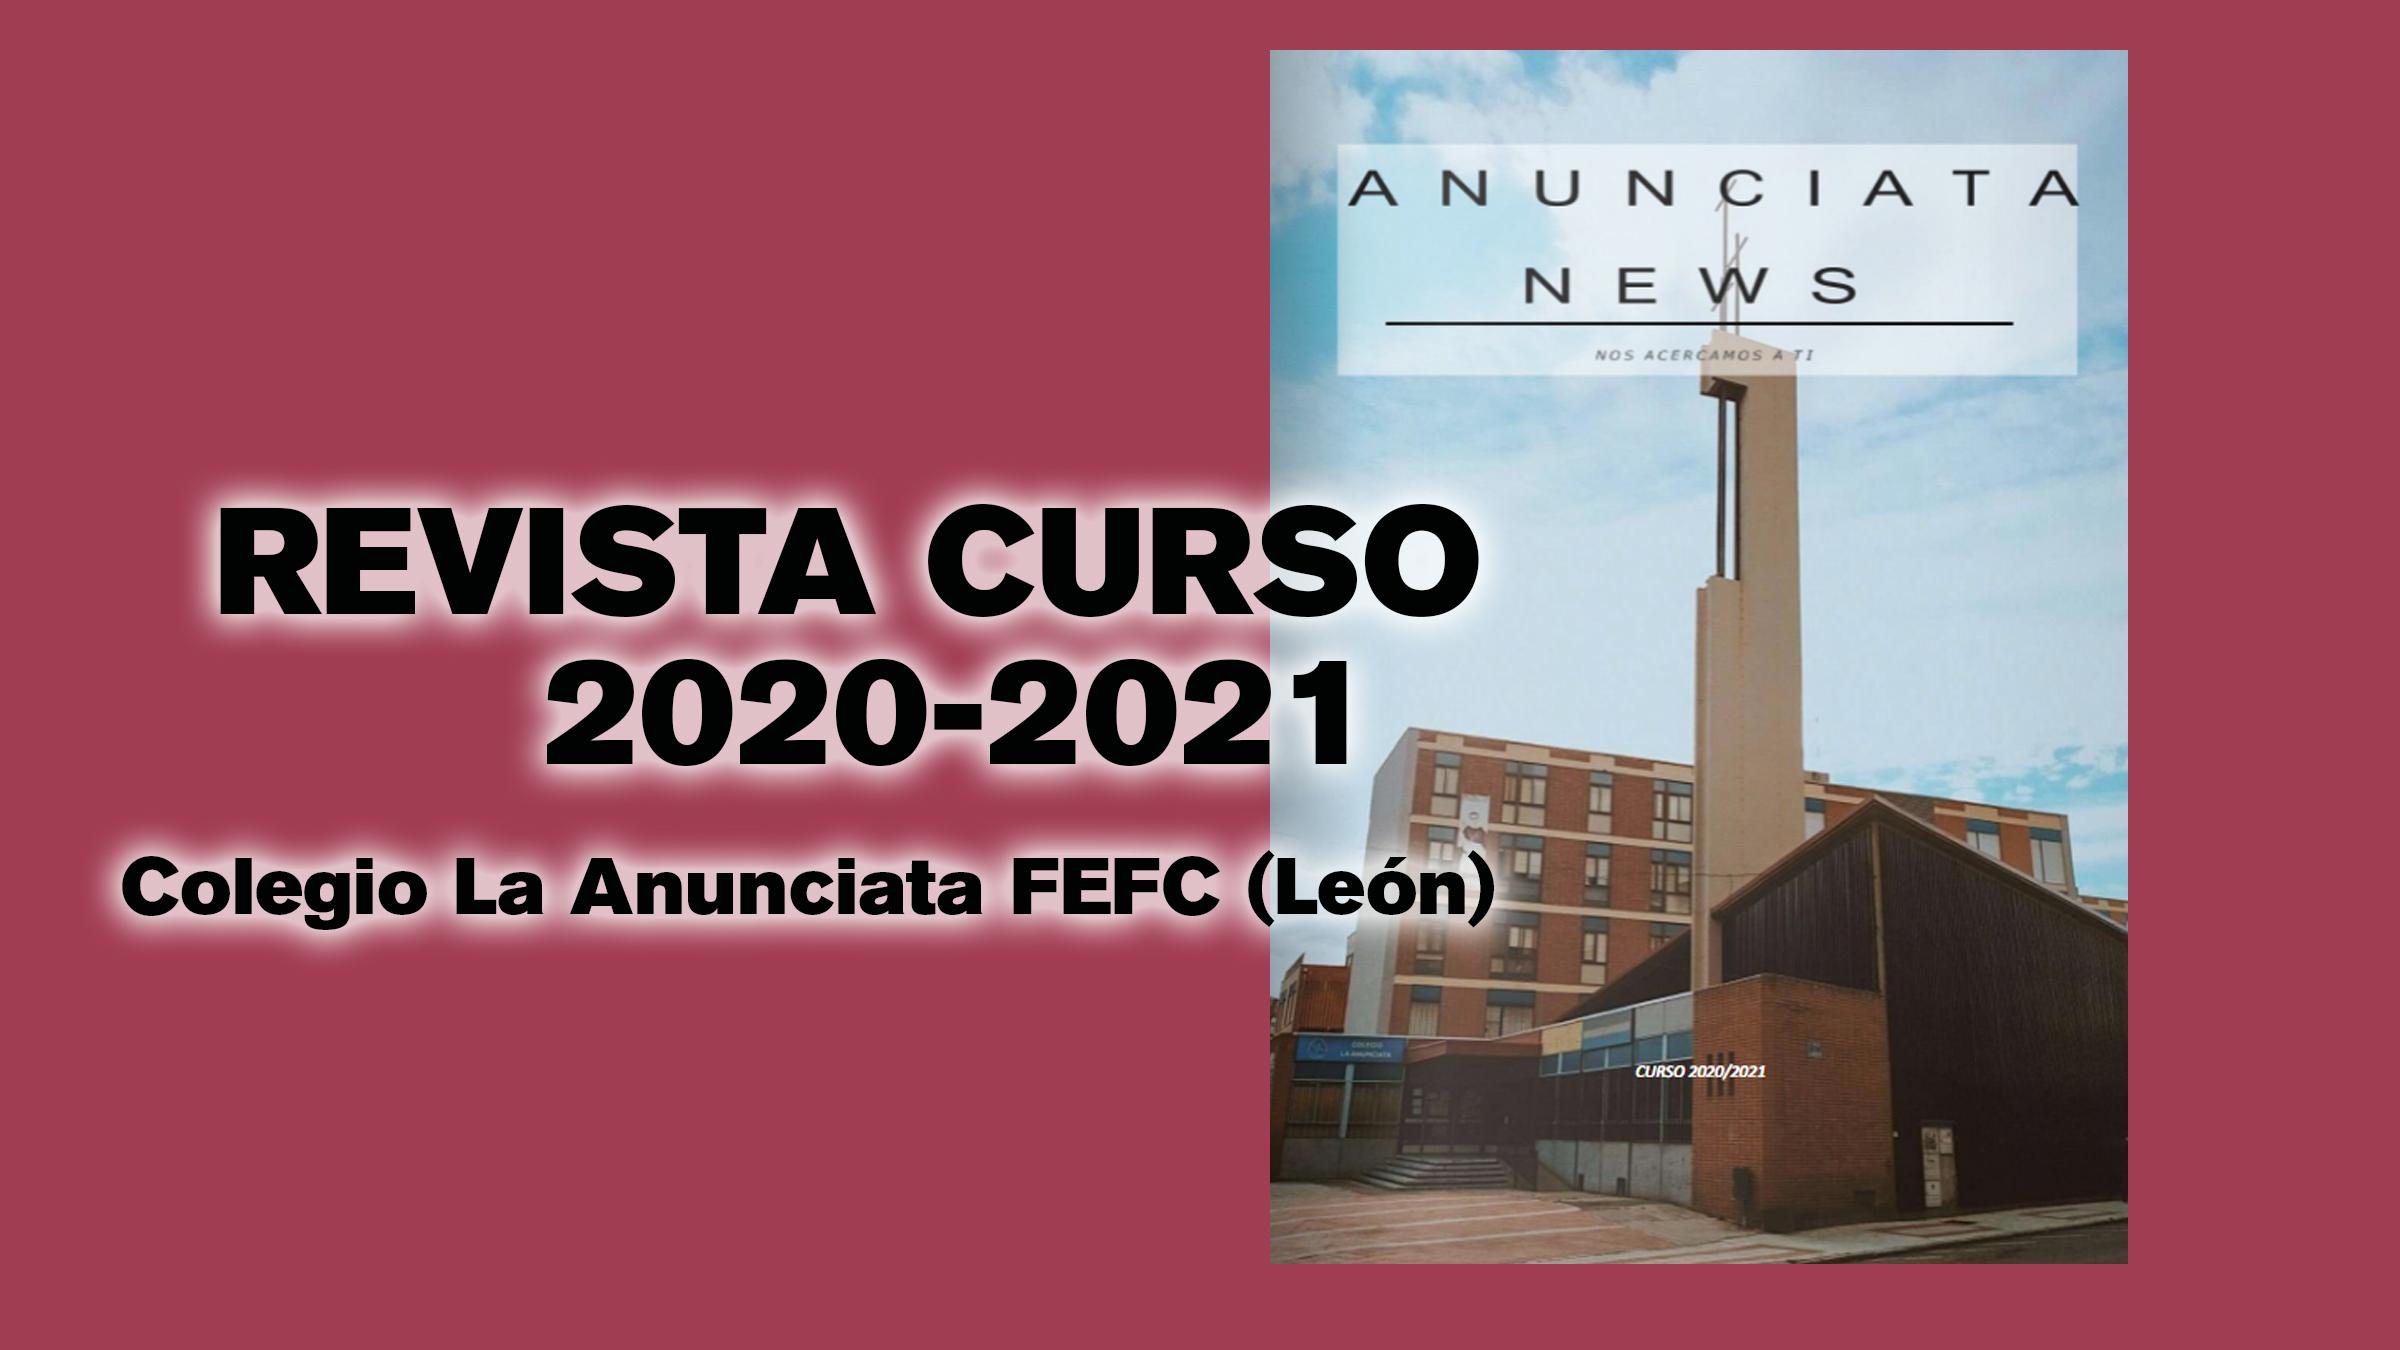 portada_news_colegio_laanunciata_fefc_leon_210718